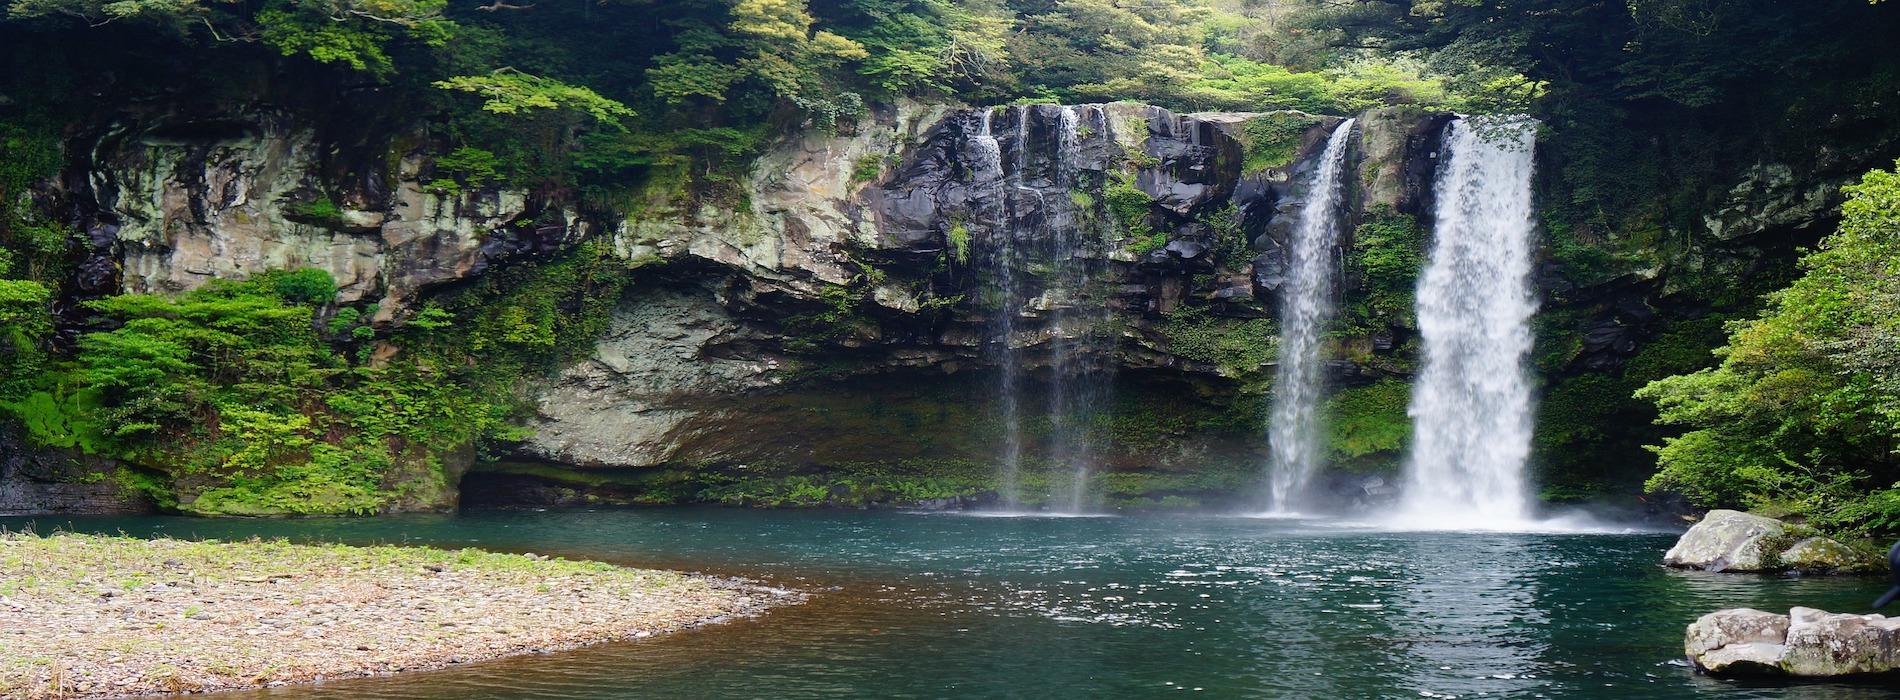 jeju-island-cheonjiyeon-waterfall-1594589_1920